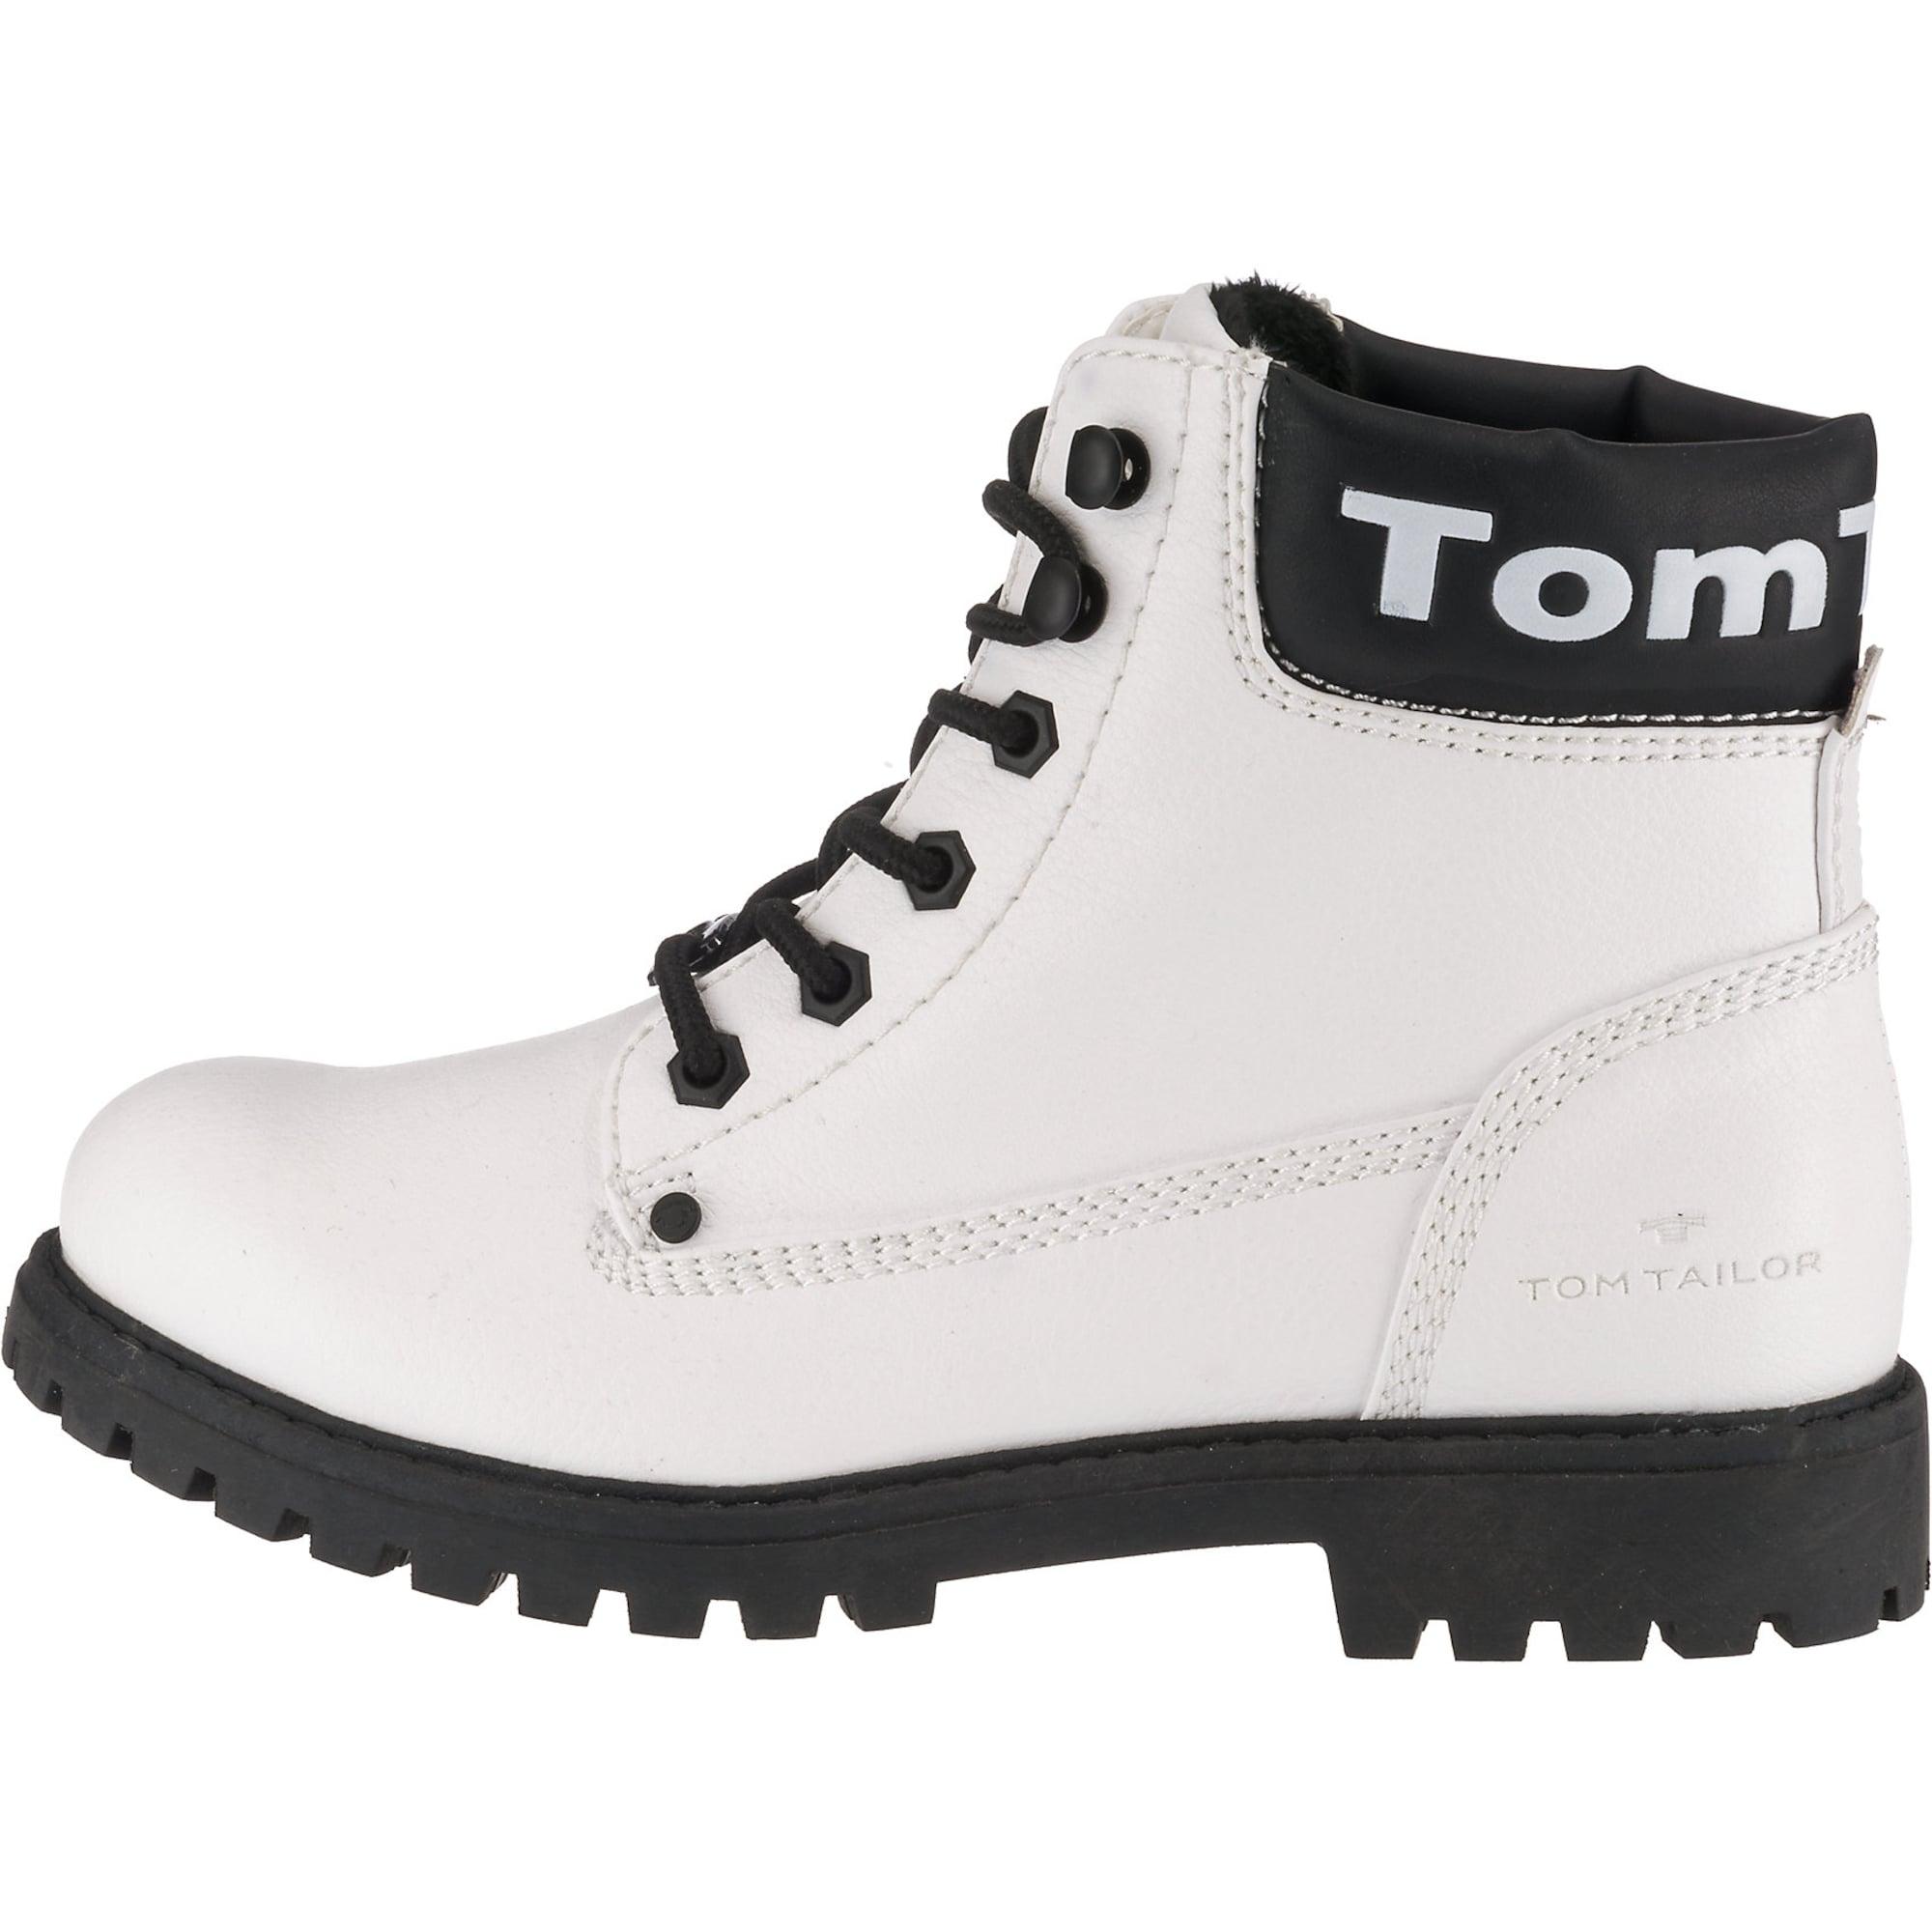 tom tailor - Stiefelette